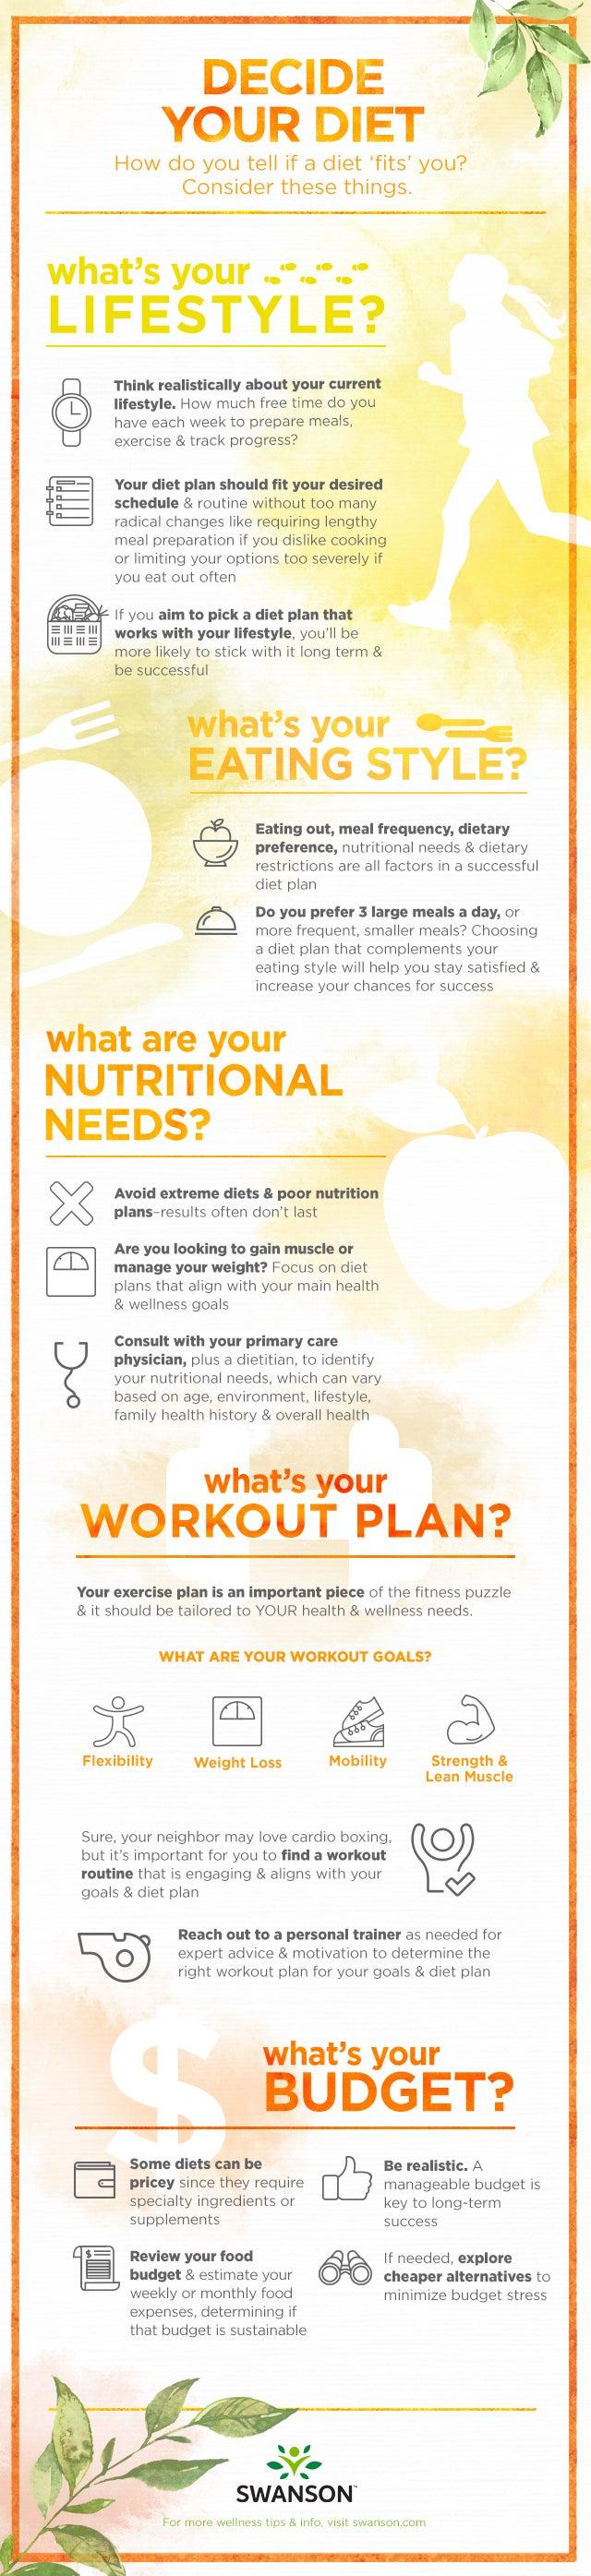 ways to decide your diet infographic